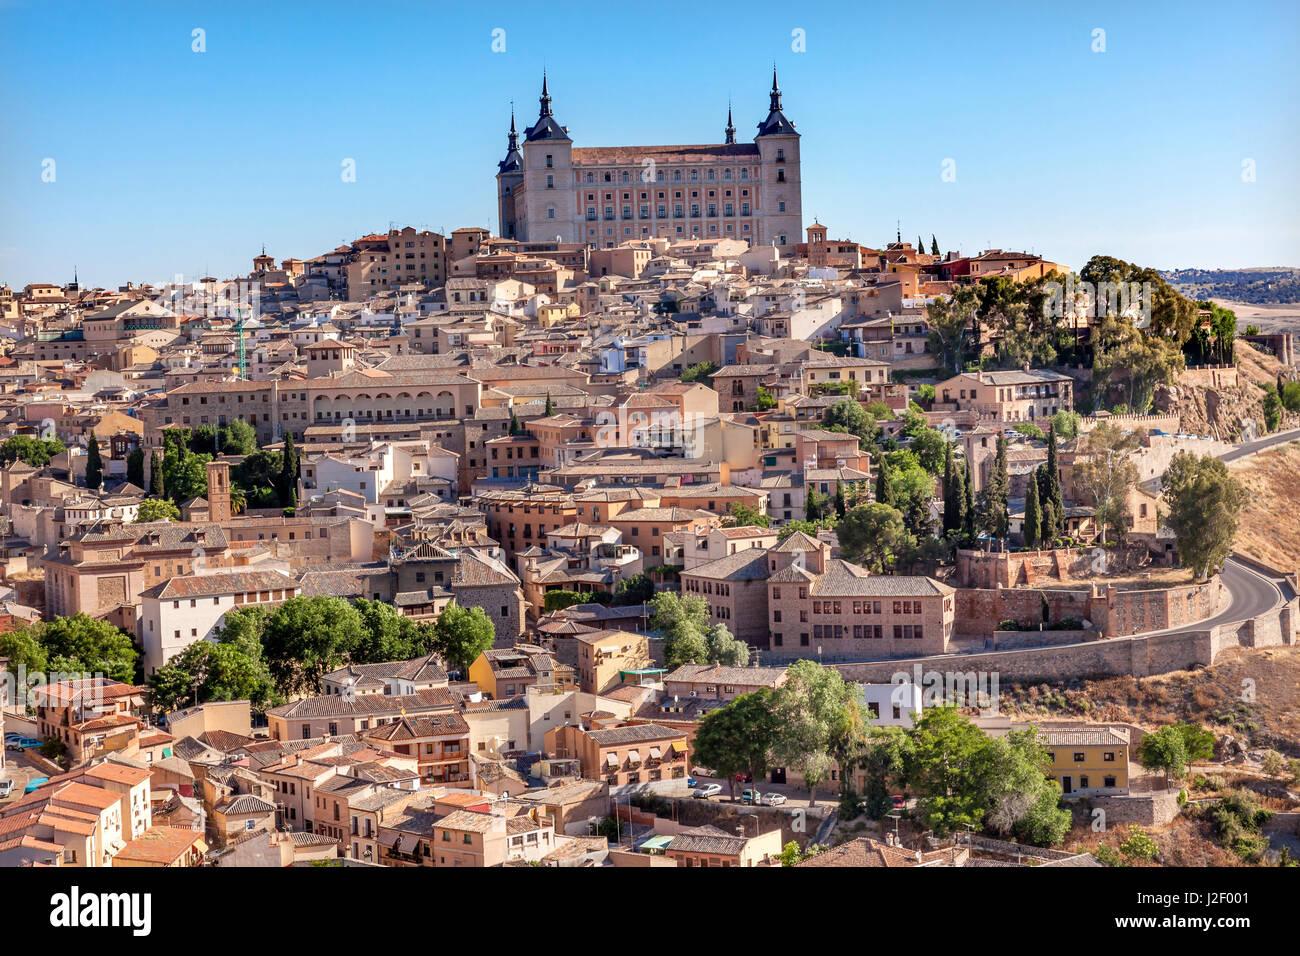 alcazar fortress medieval city toledo spain alcazar built in the